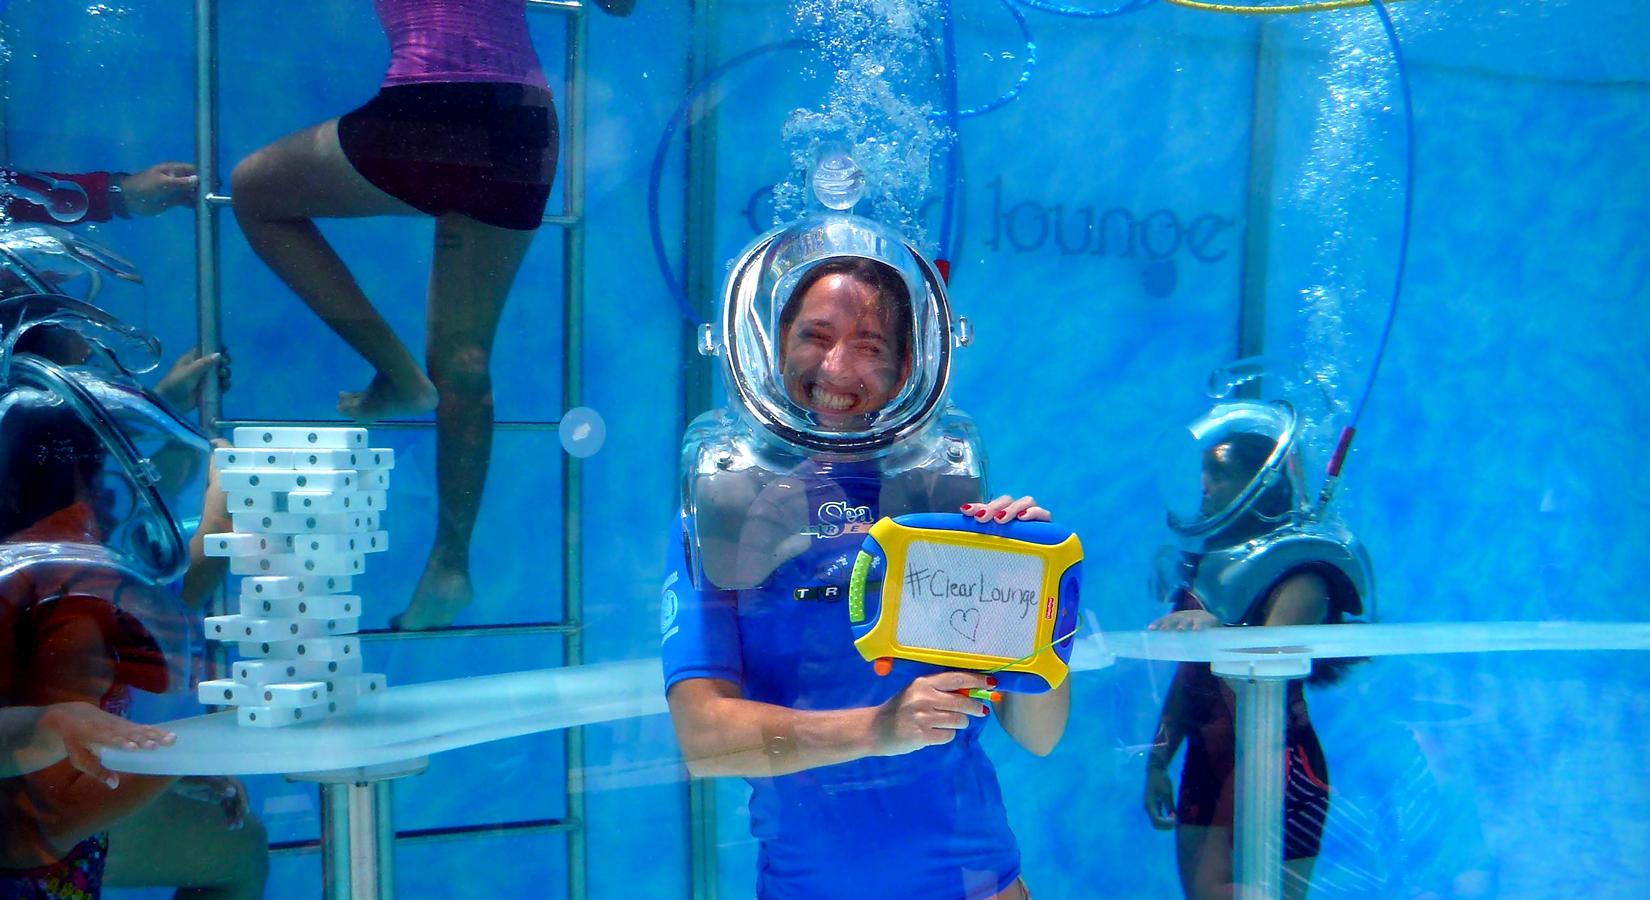 clearlounge-underwater-oxygen-bar-hashta